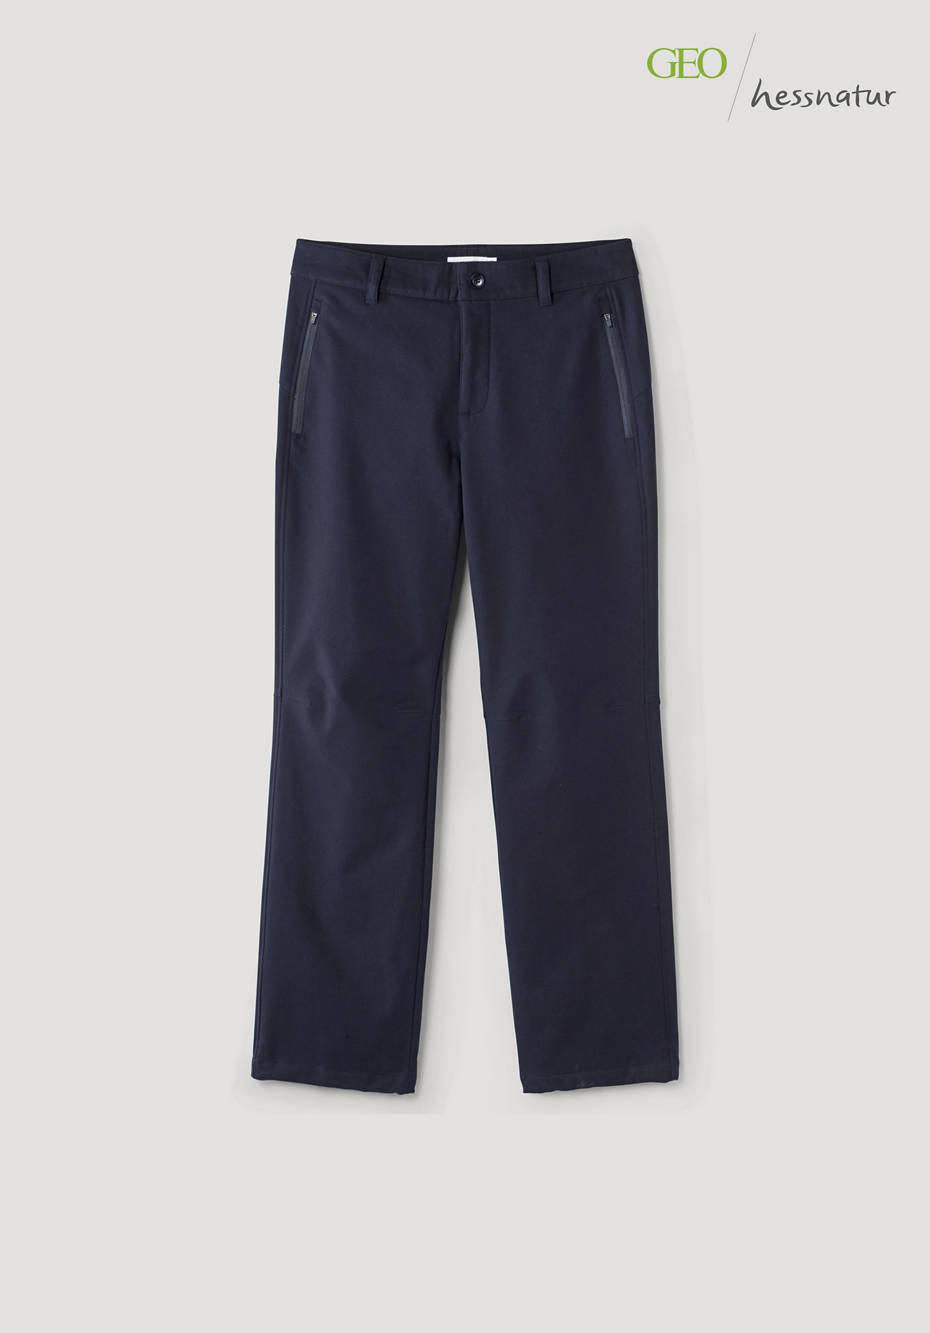 Softshell pants made of organic cotton